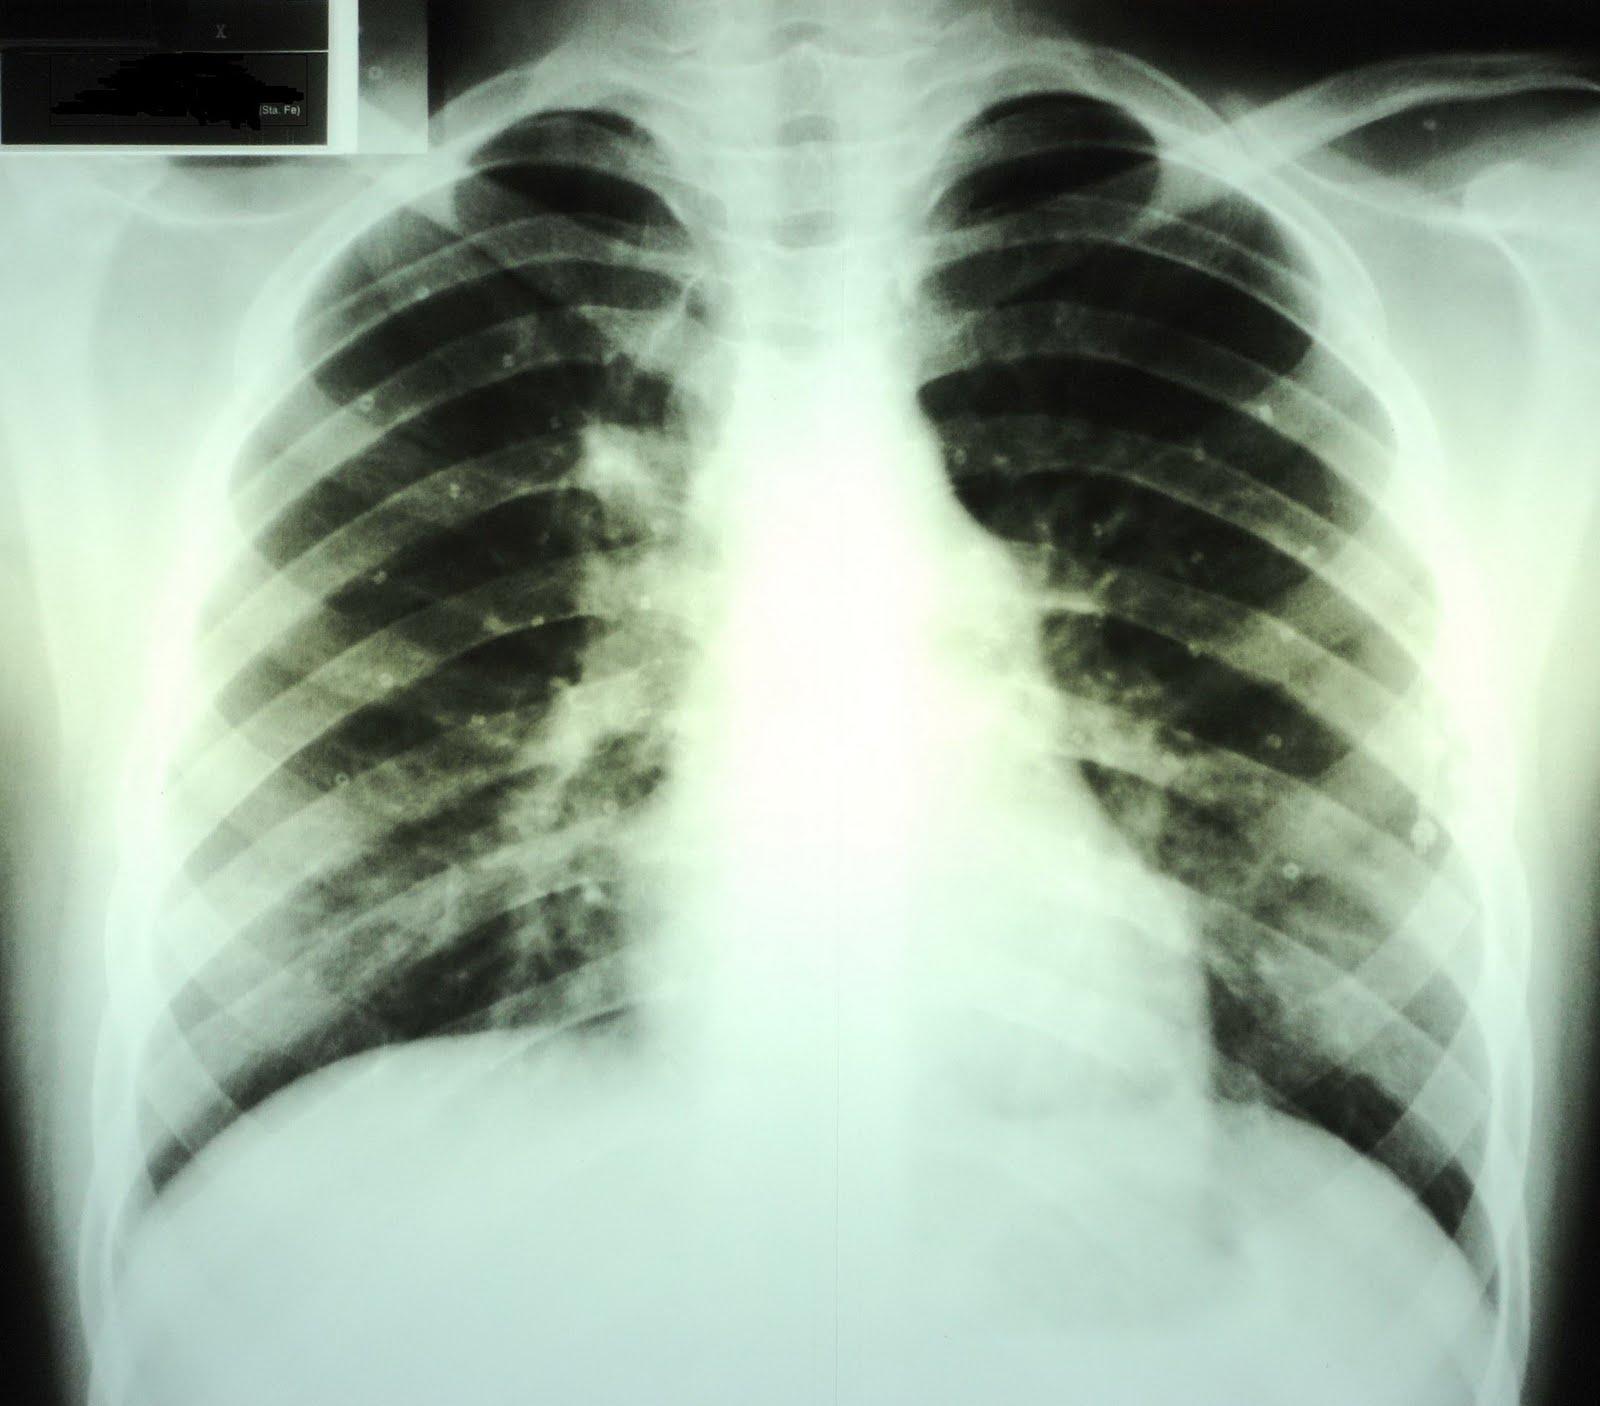 Fernando G. Meneghetti: Falsas imágenes pulmonares